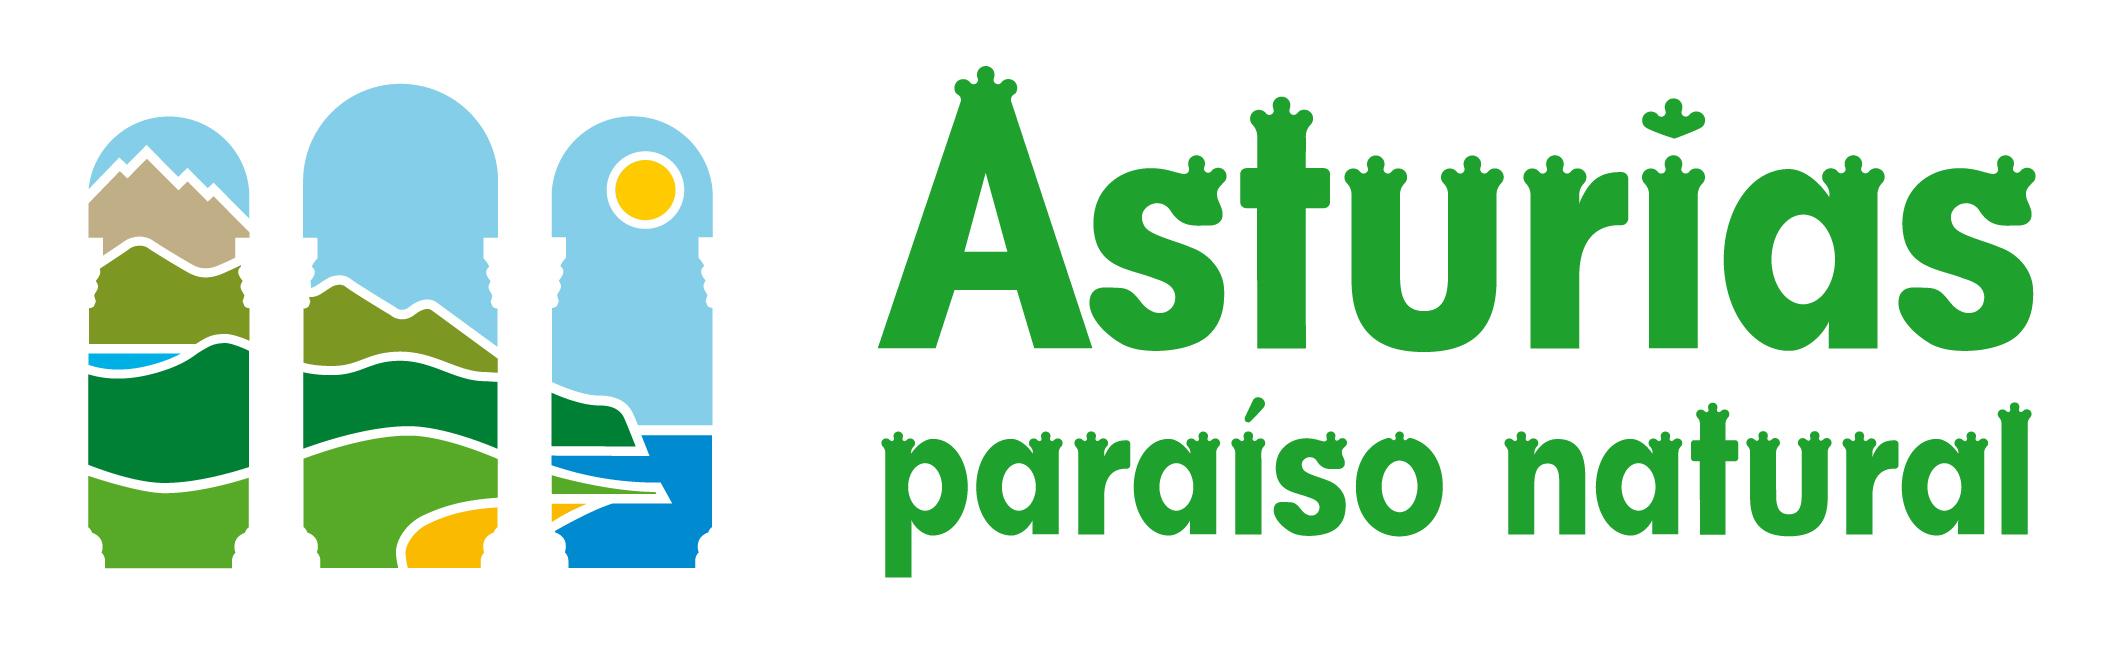 Asturias_paraiso_natural1.png